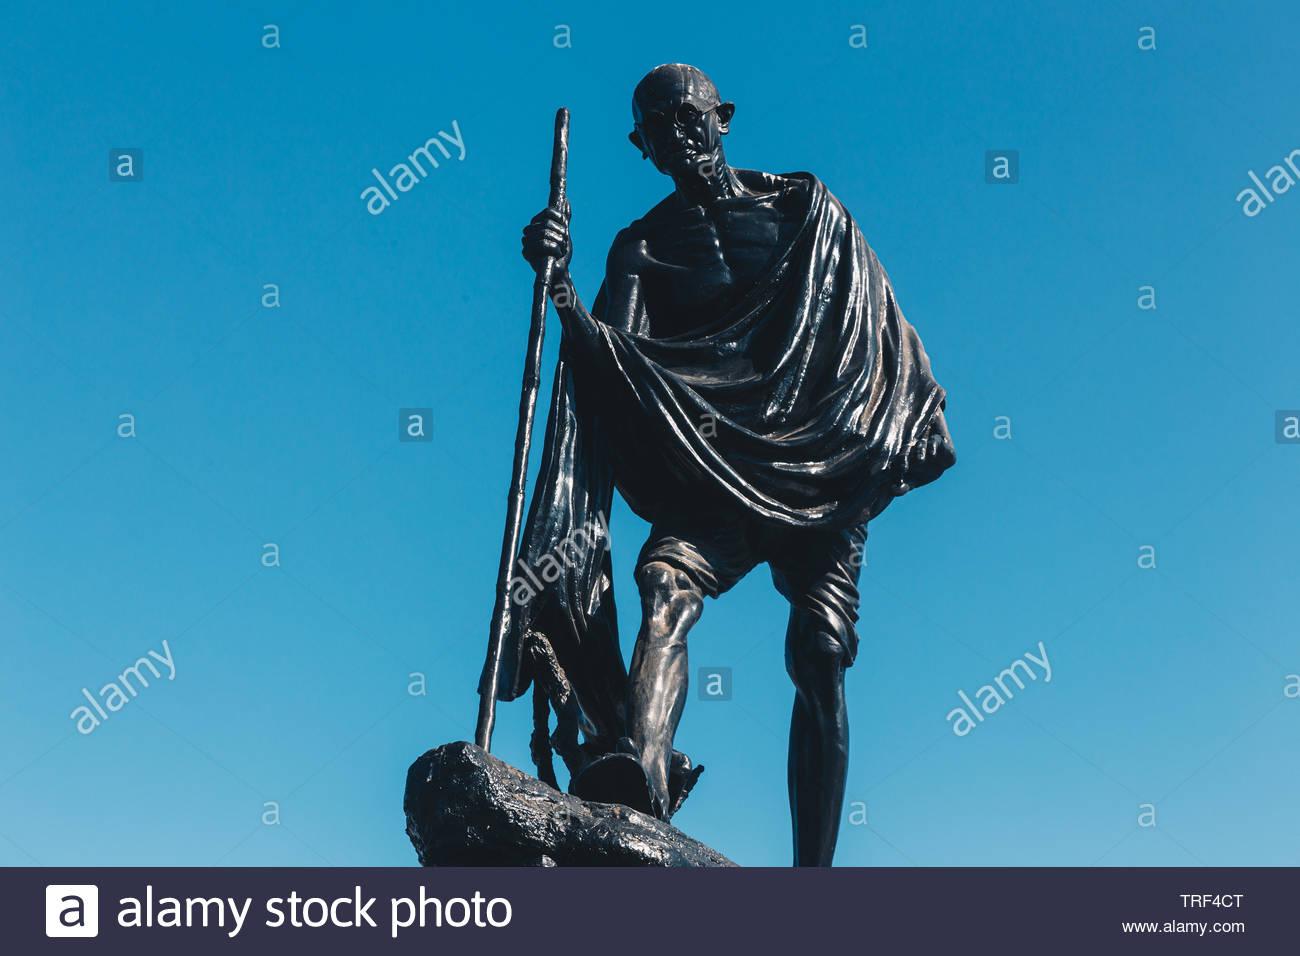 Mahatma Gandhi Statue in Chennai, India - Stock Image